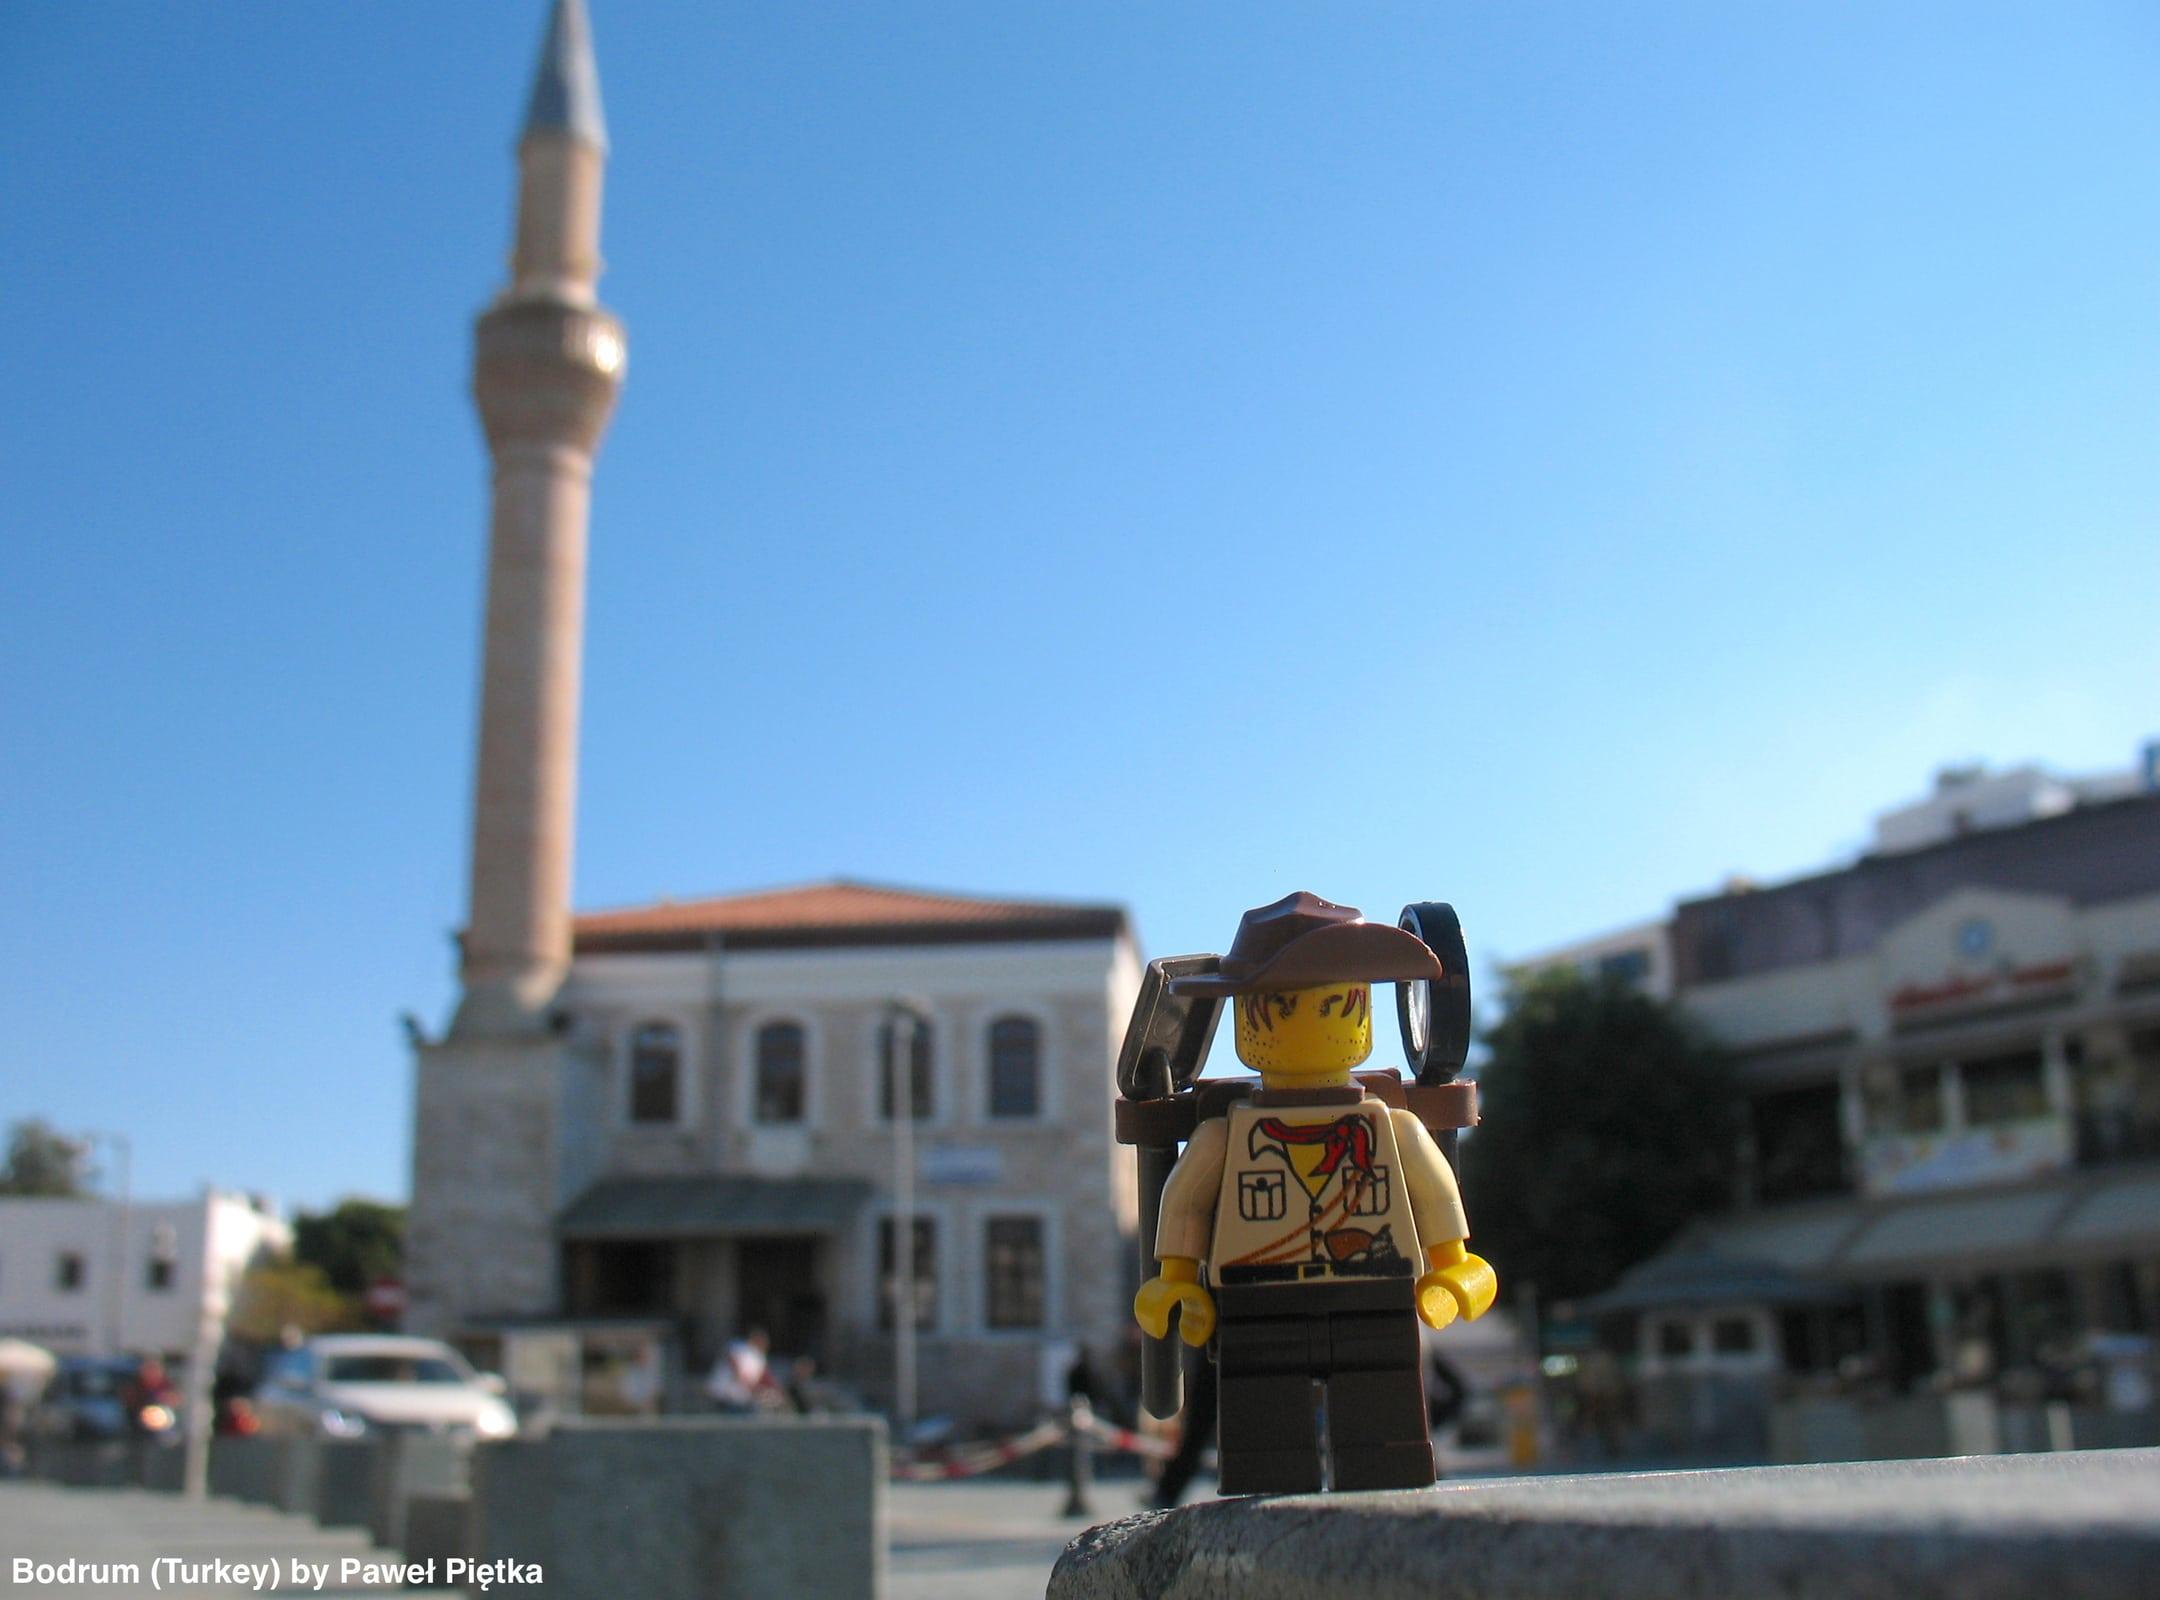 Bodrum (Turkey) - Merkez Adliye Mosque